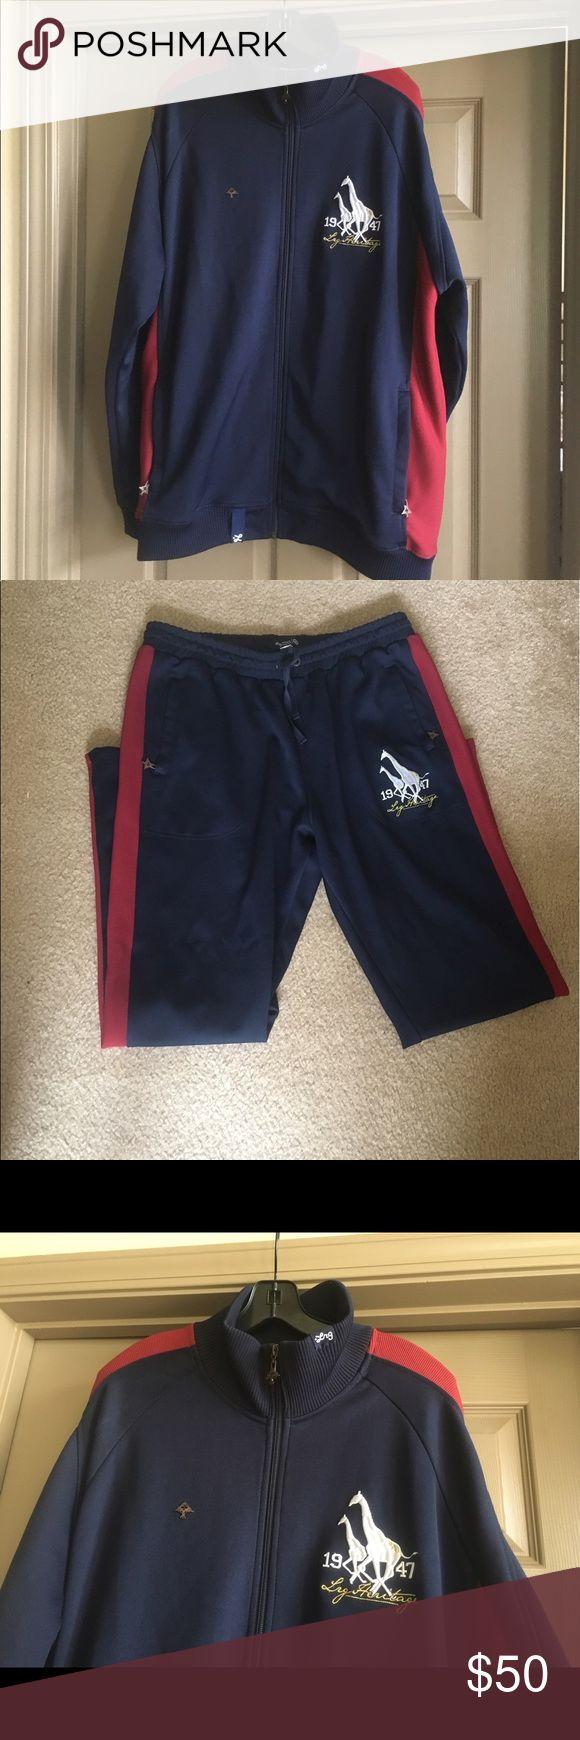 Men's LRG Sweat Suit, Jogging Suit Two piece set LRG Very Good Condition! Very attractive Set! Lrg Suits & Blazers